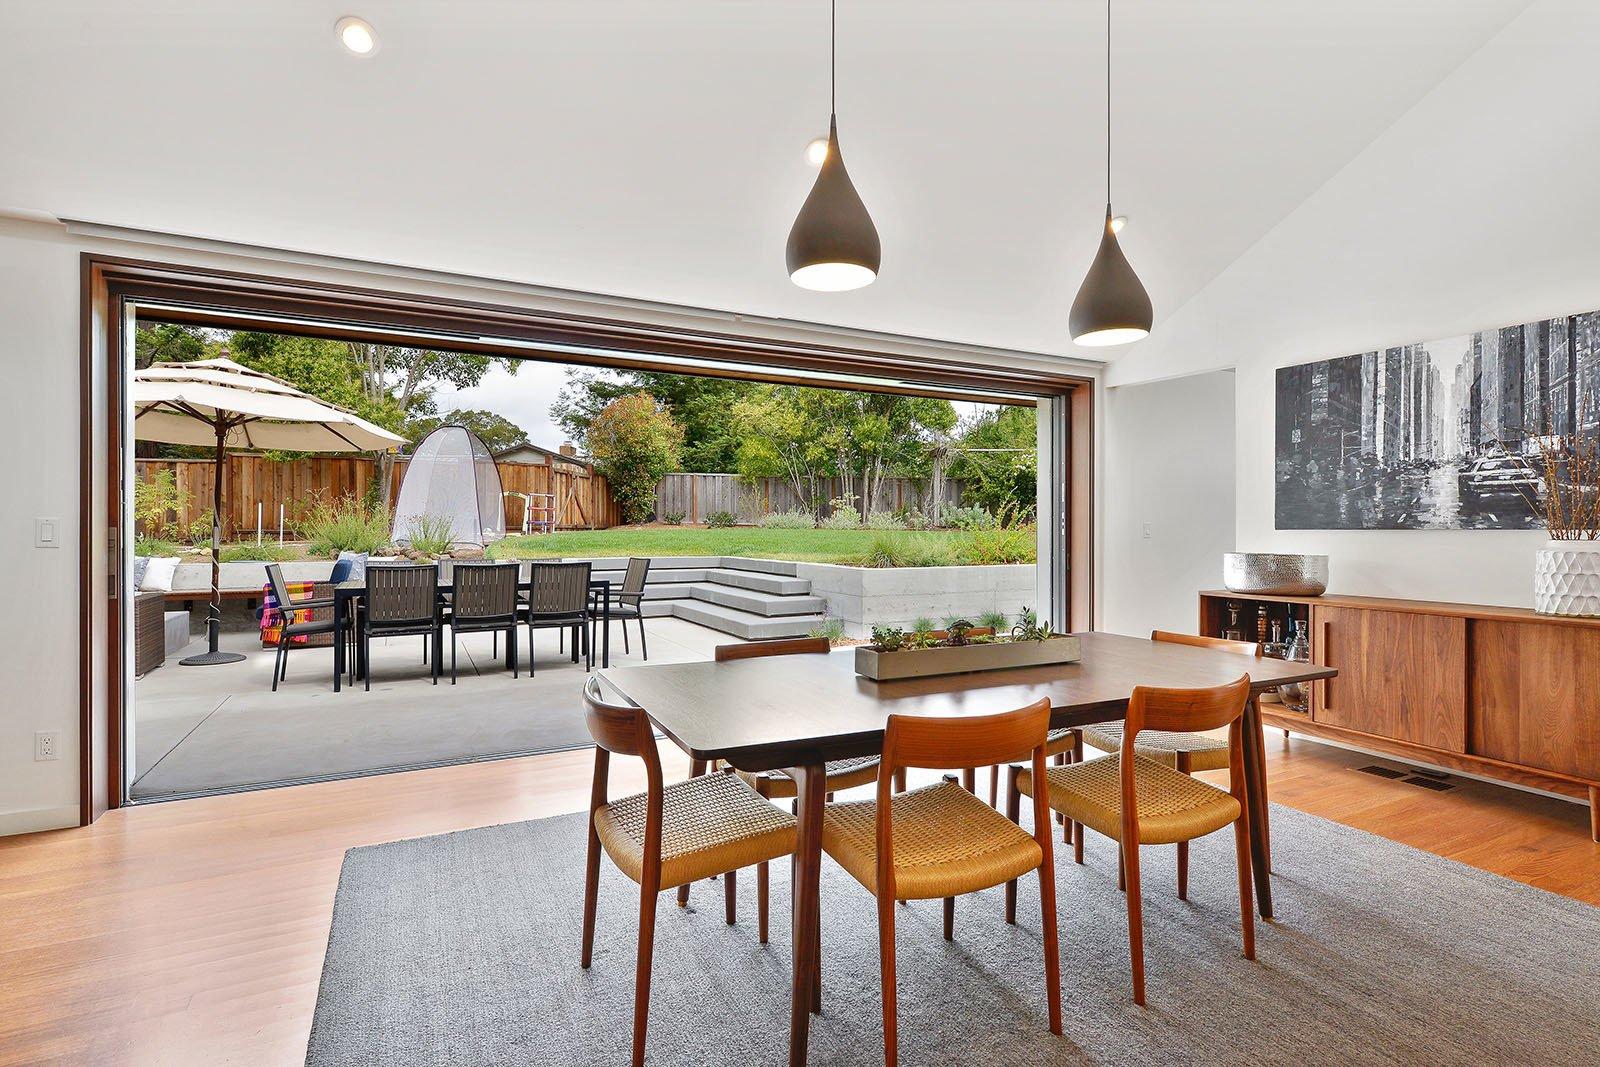 Dining Room, Chair, Pendant Lighting, Table, and Medium Hardwood Floor Dining room  Portola Valley by patrick perez/designpad architecture